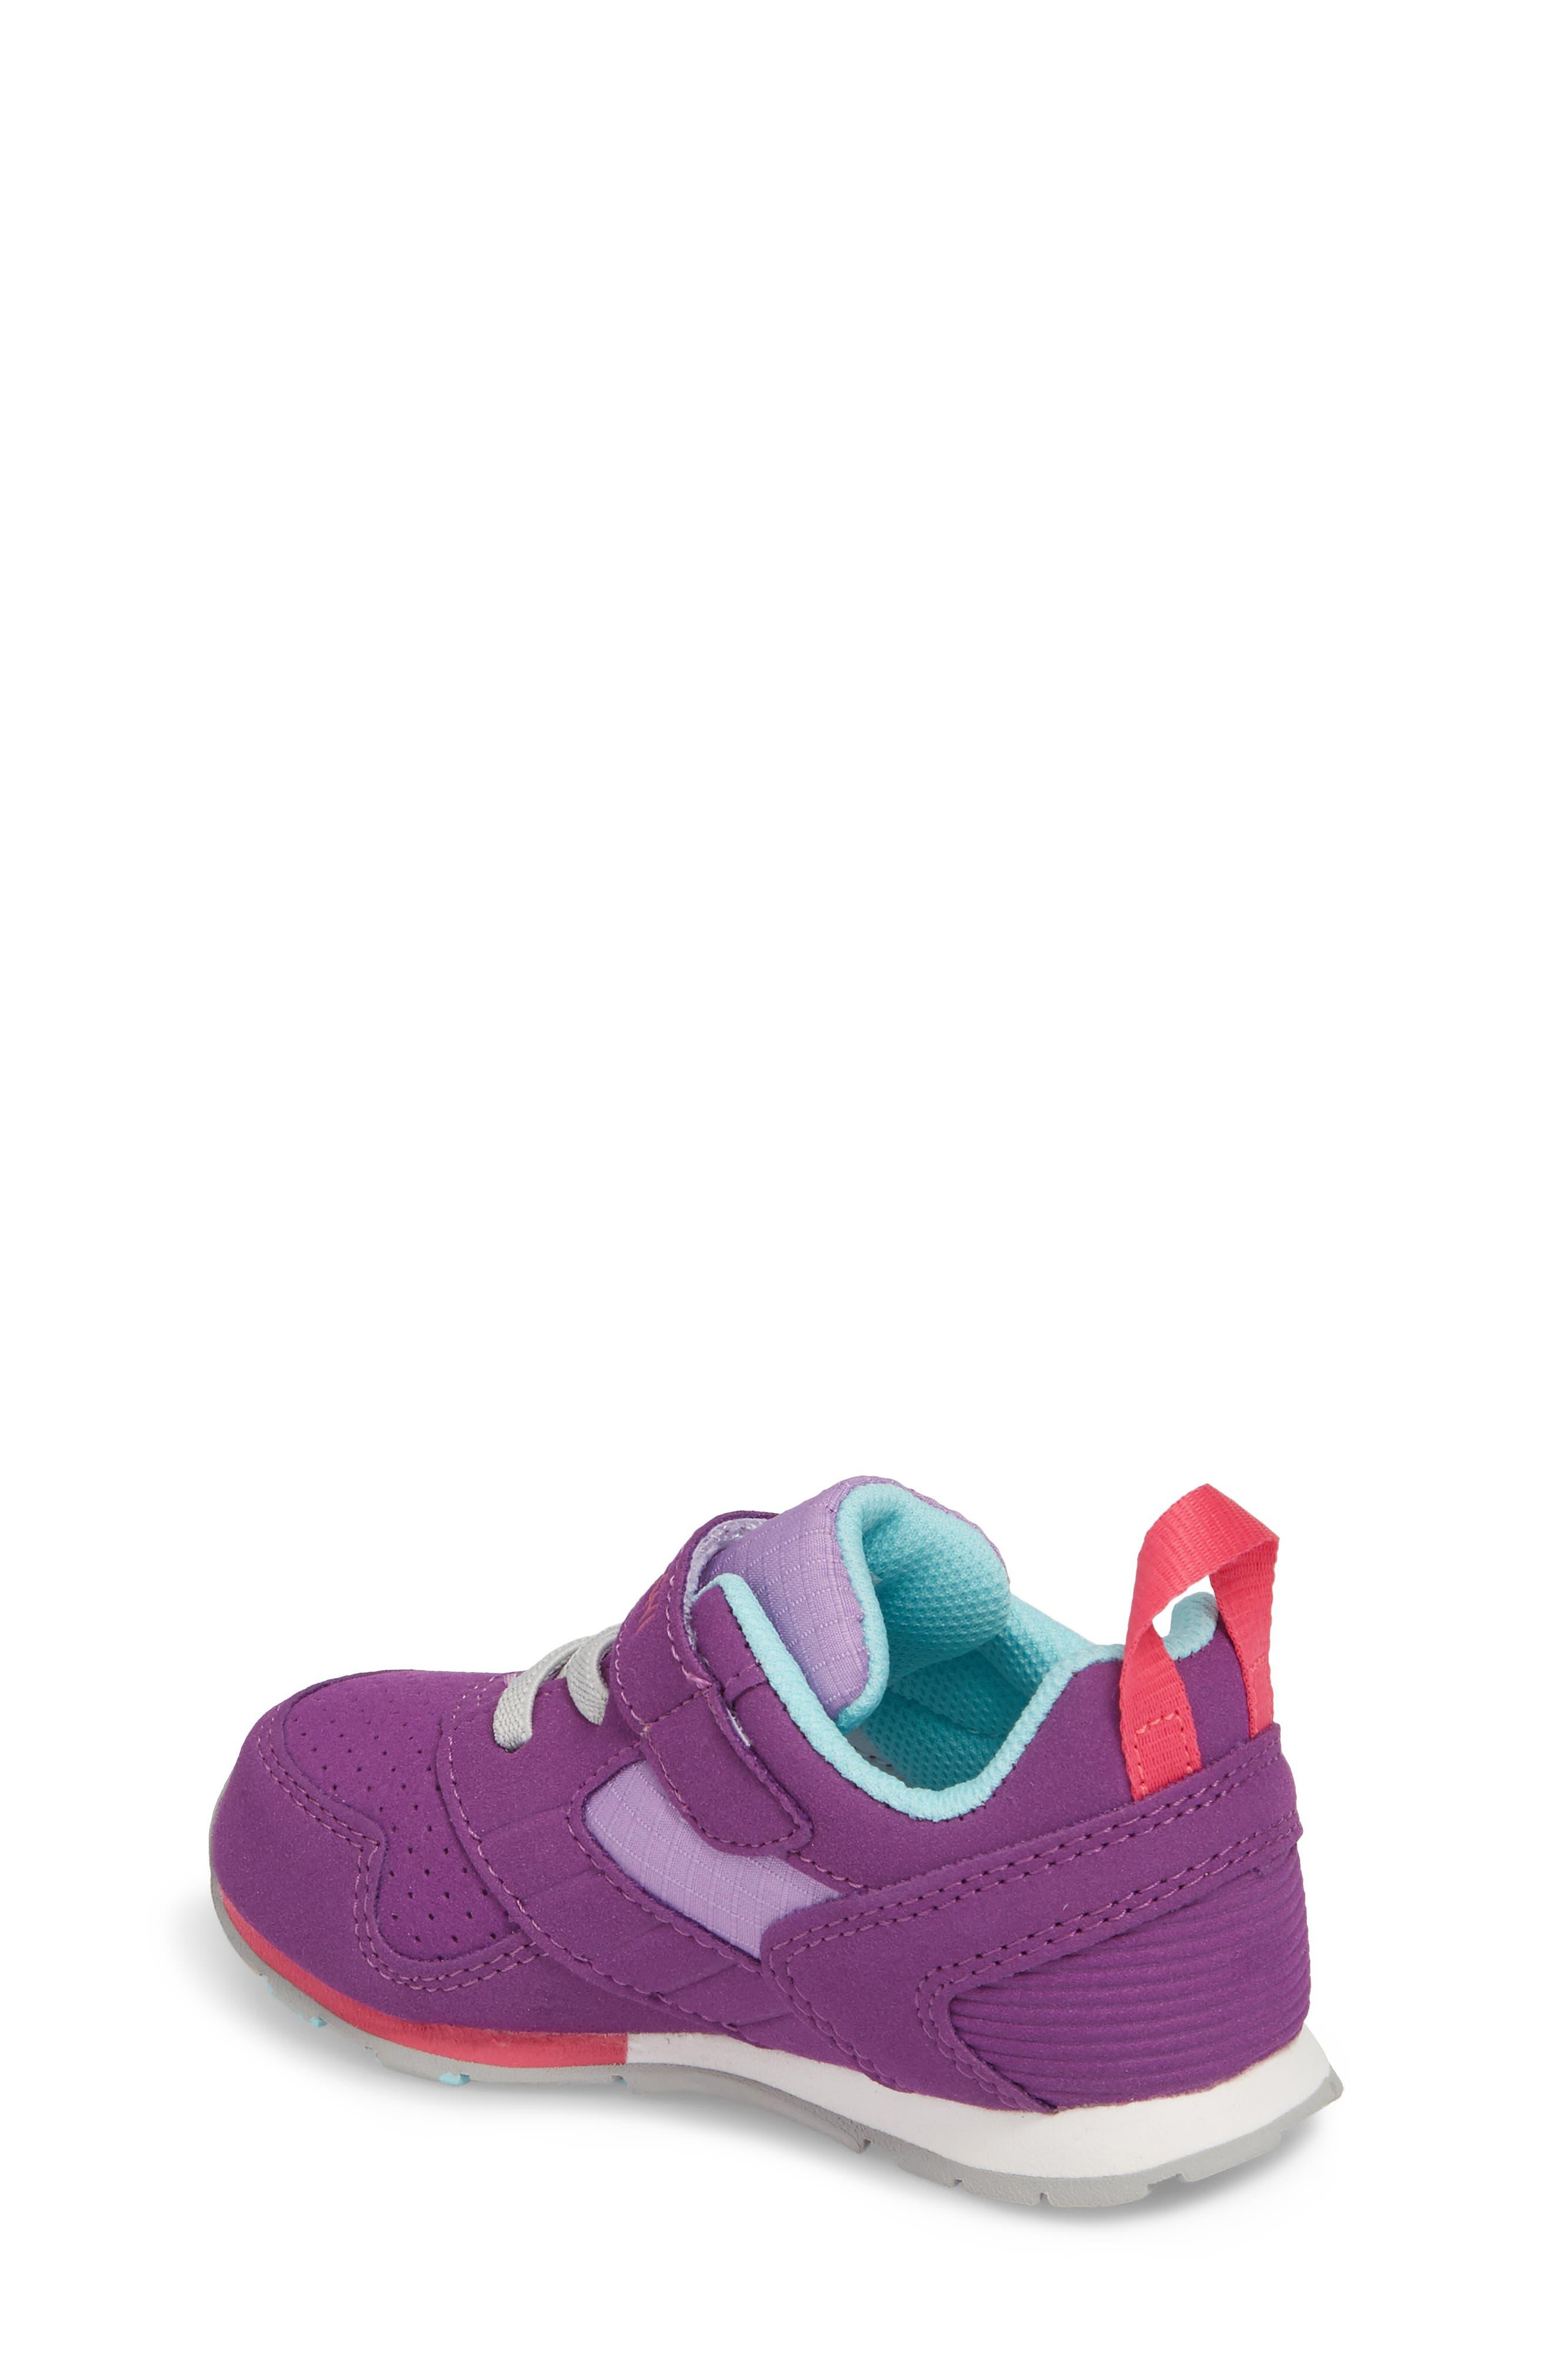 Alternate Image 2  - Tsukihoshi Racer Washable Sneaker (Walker, Toddler & Little Kid)